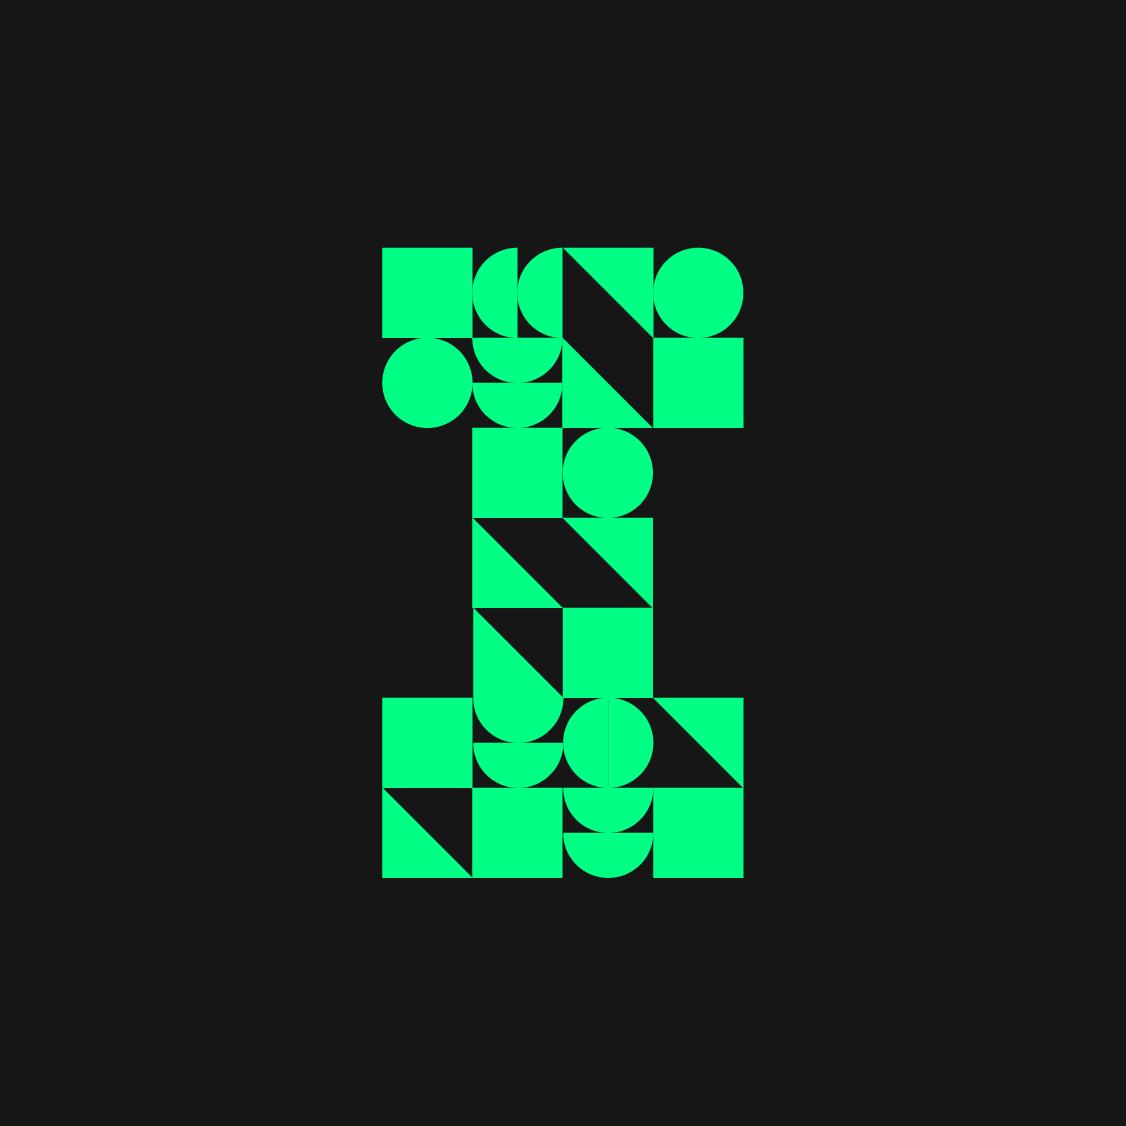 all-logos-2020-22